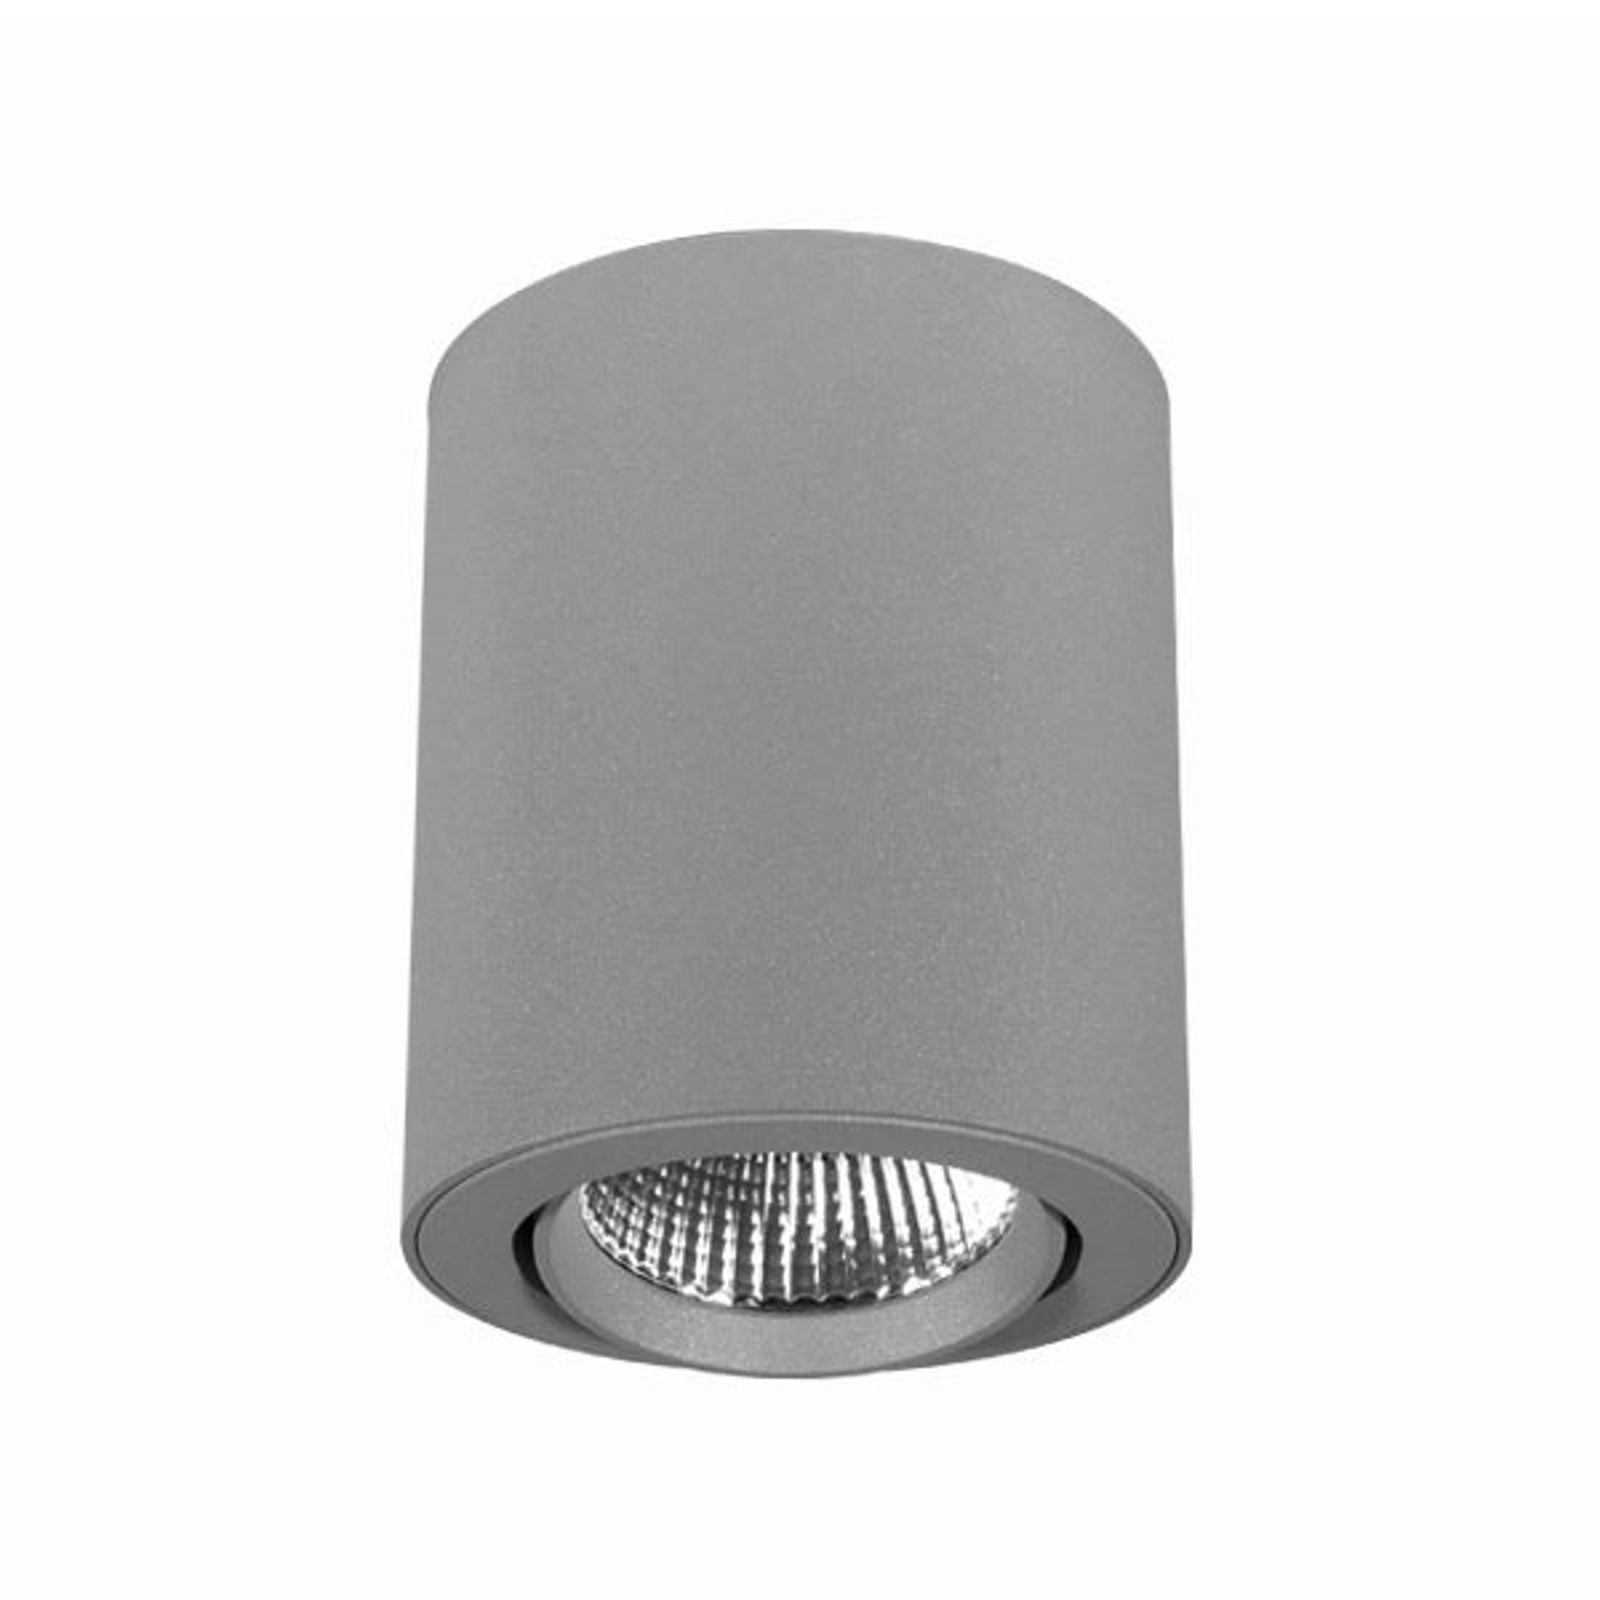 Spot LED girevole/orientabile Button 300, 14 W